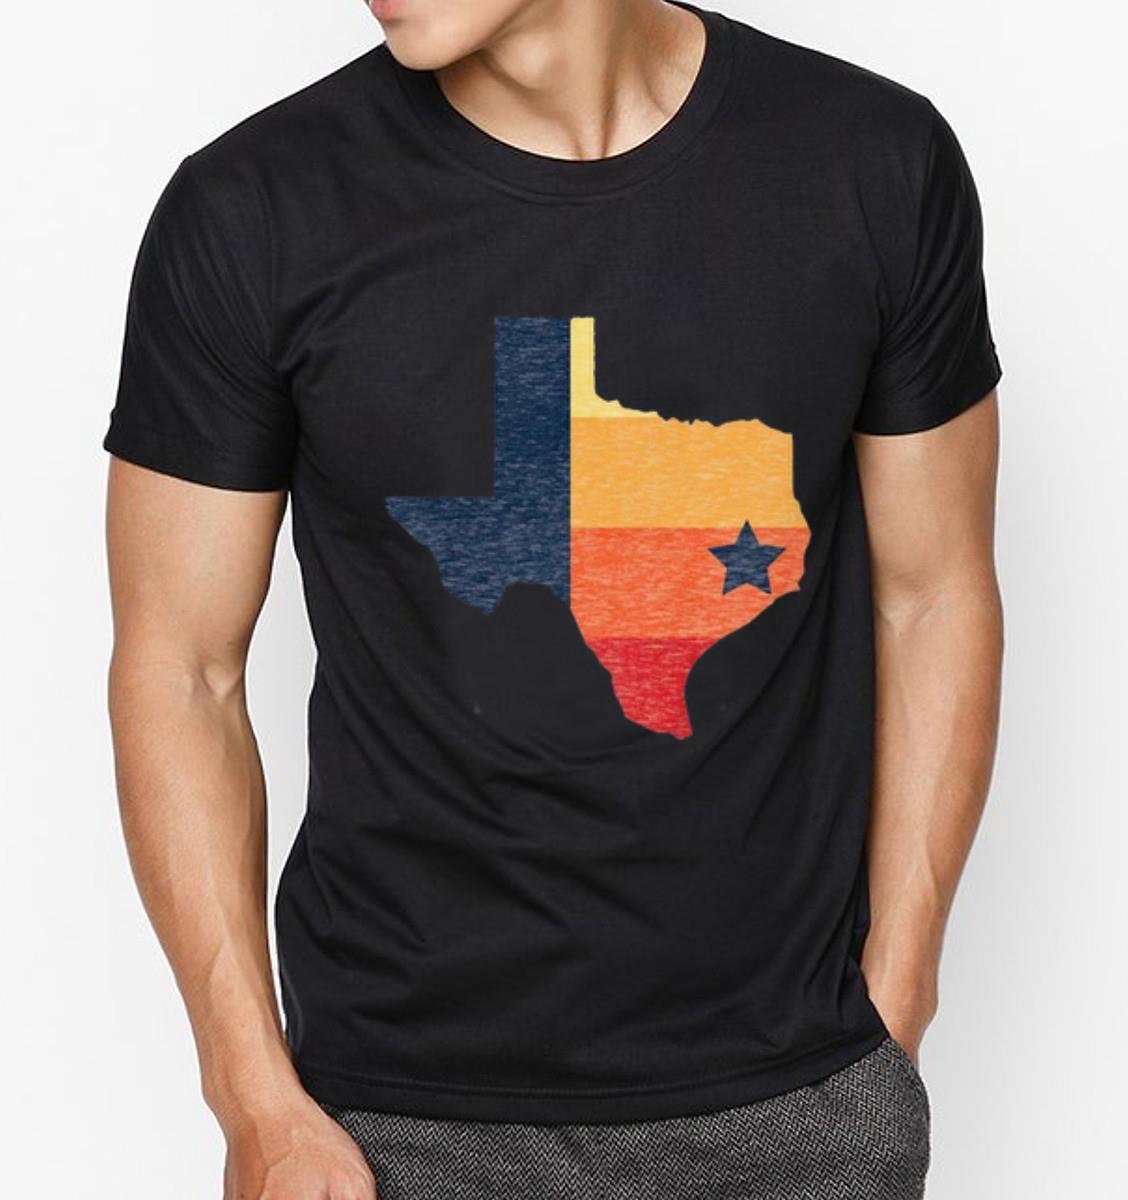 Official Vintage Texas Map Houston Baseball Colors Shirt 3 1.jpg